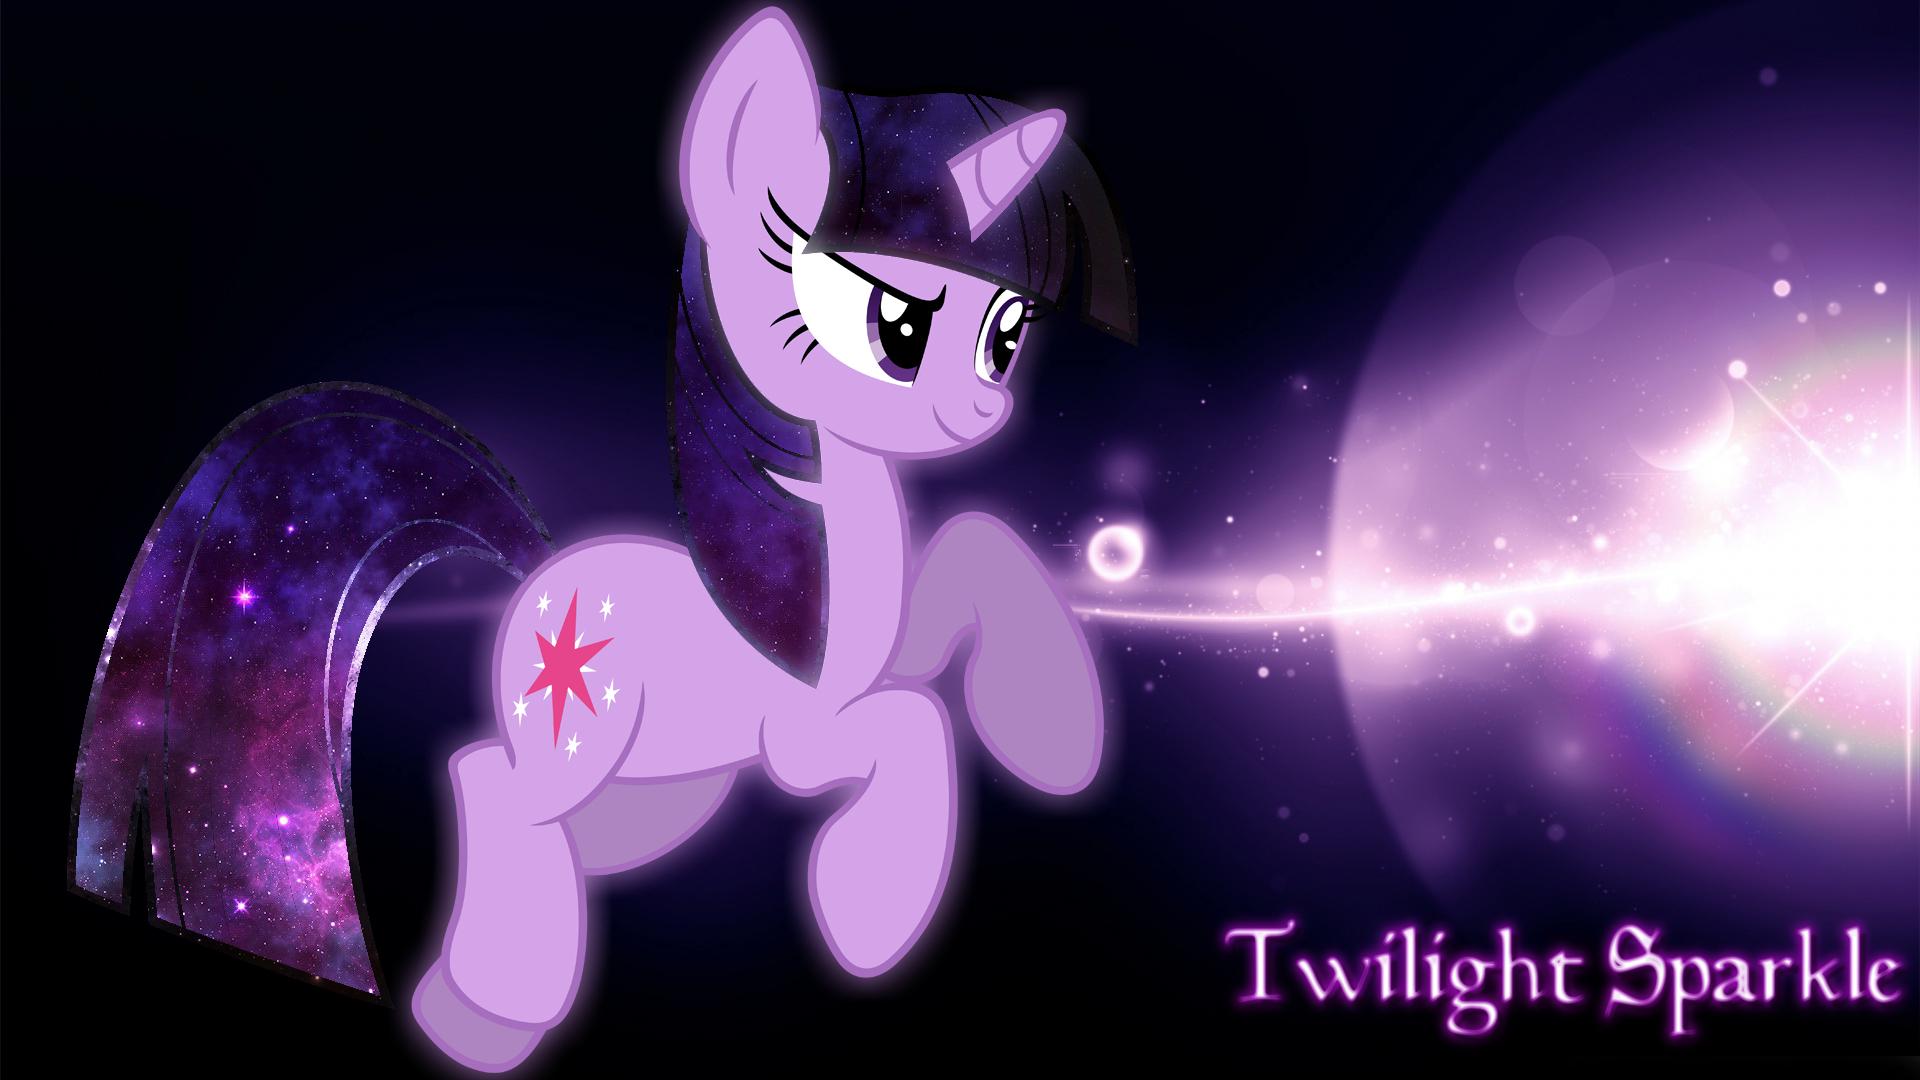 Twilight Sparkle - Universe Wallpaper by NightmareDashy